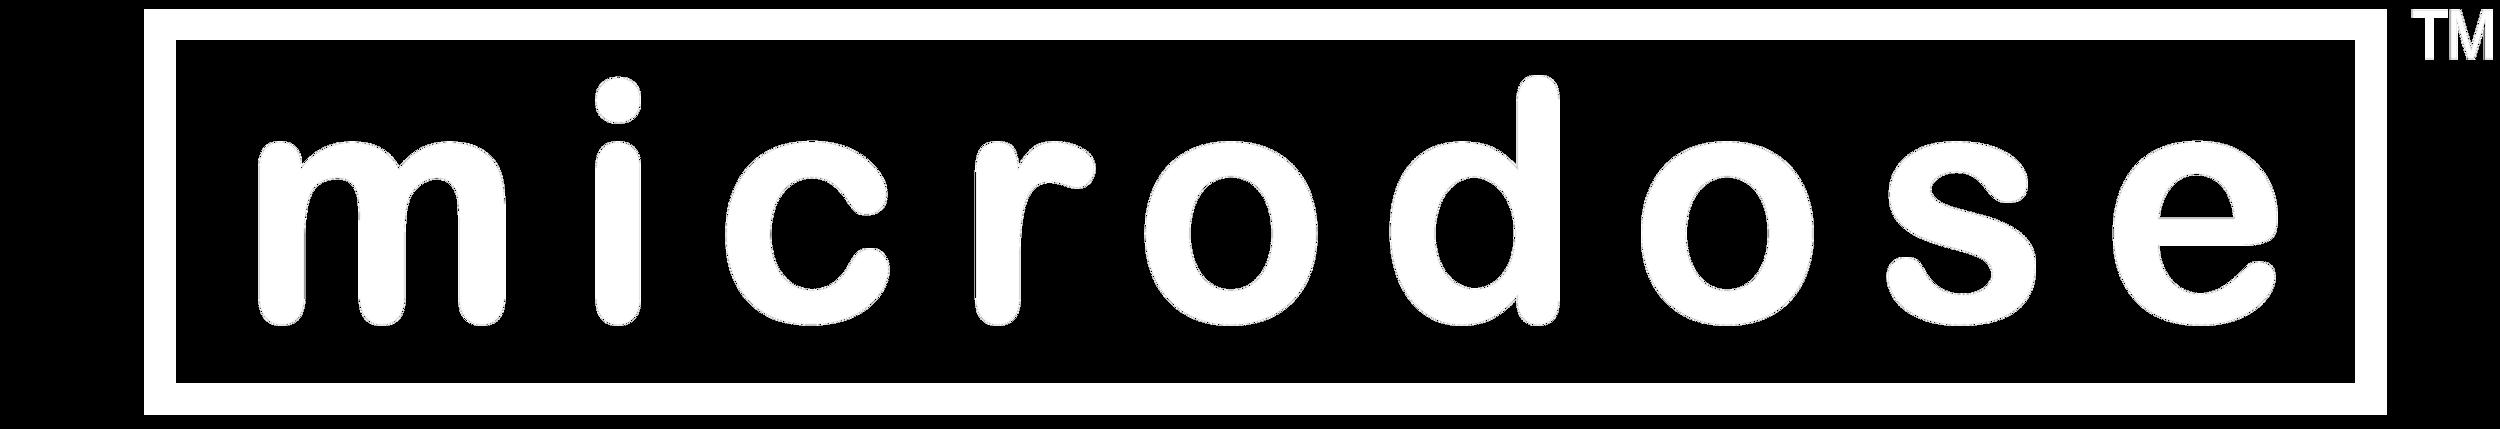 microdose logo.png